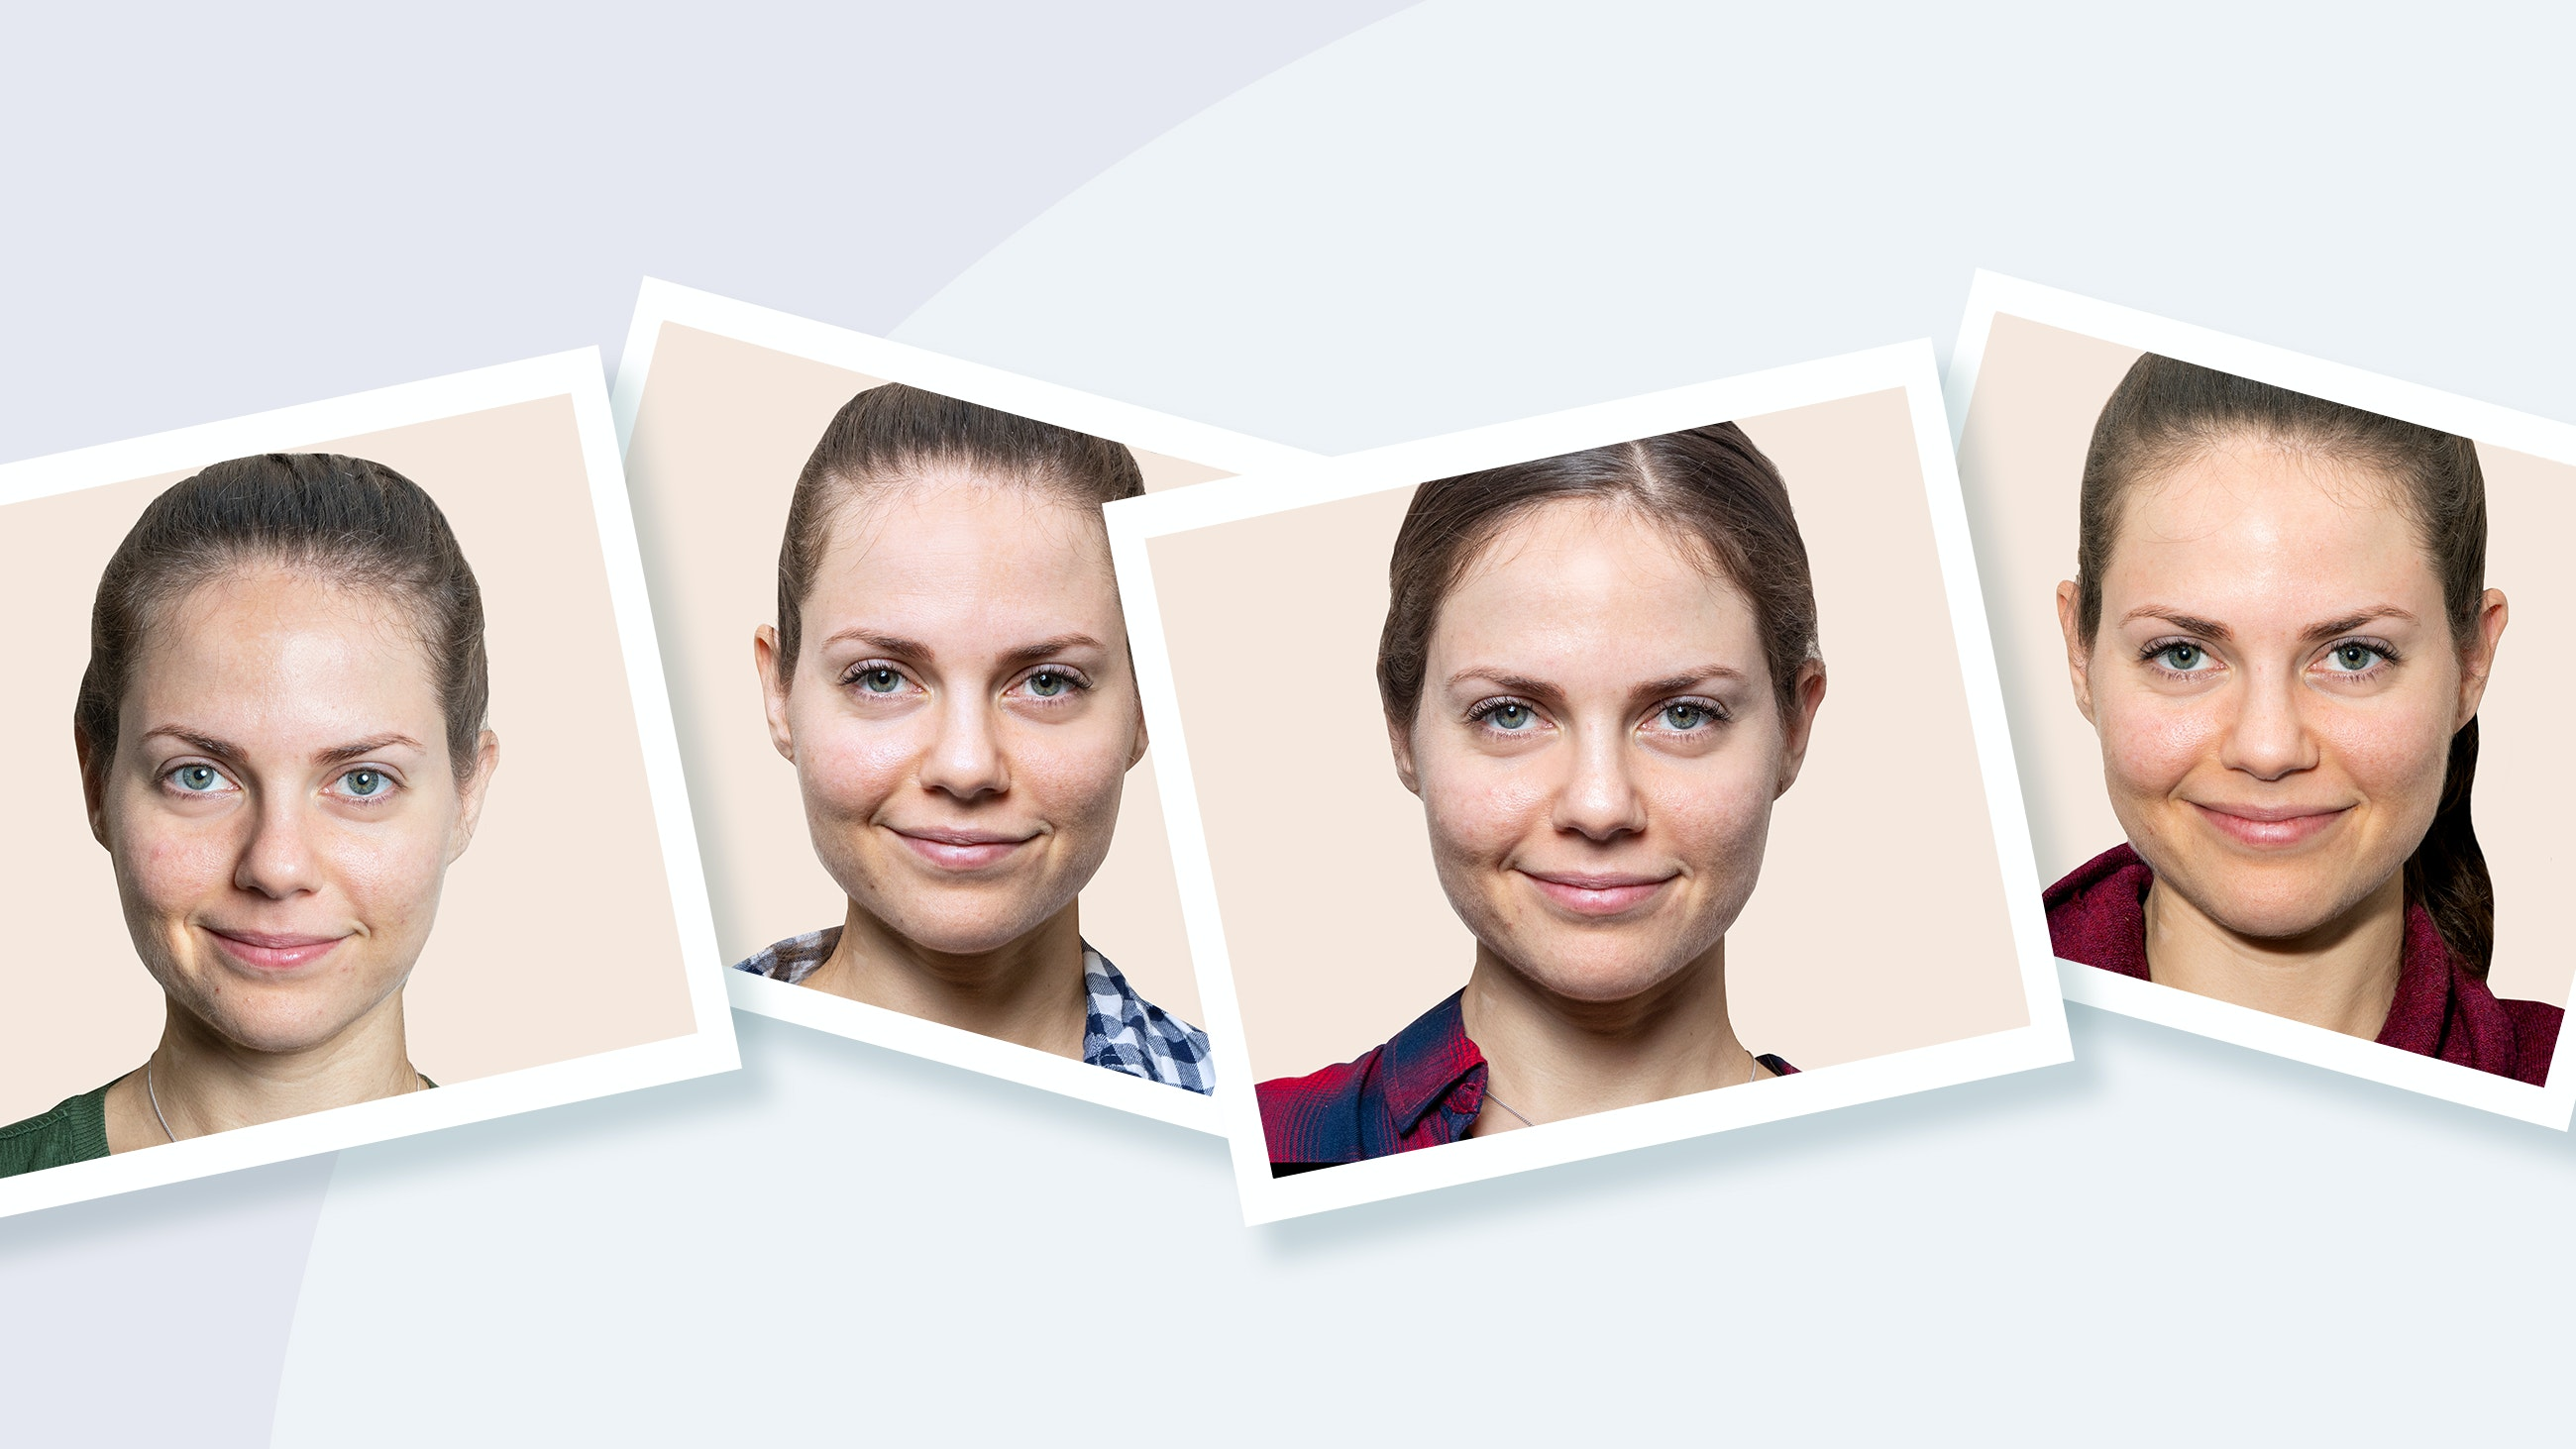 woman no makeup challenge for 30 days